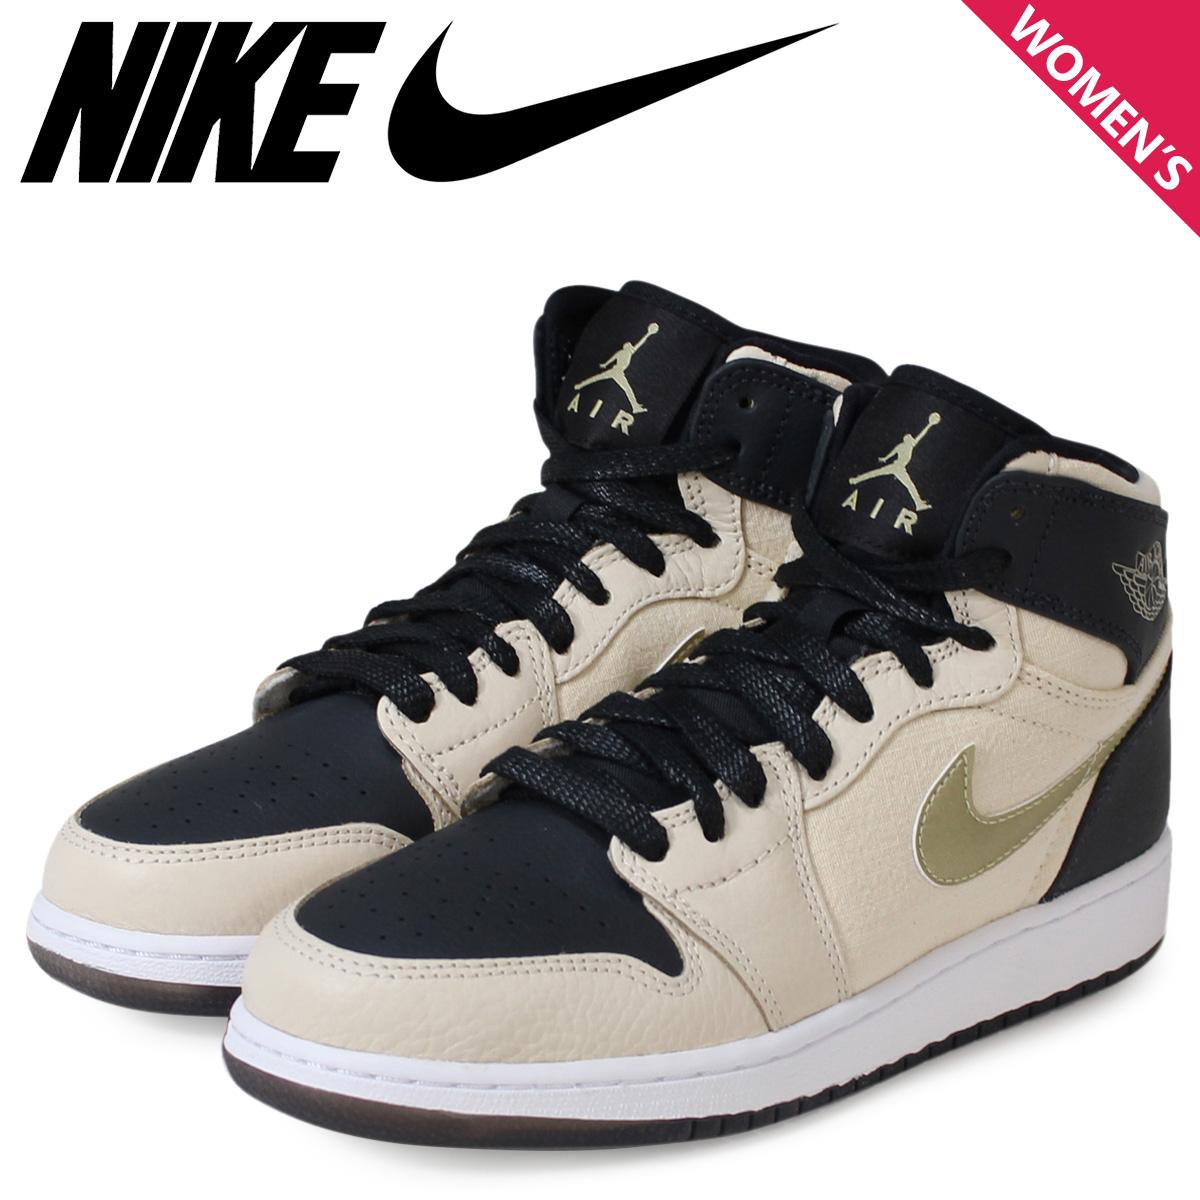 07728fab Categories. « All Categories · Shoes · Women's Shoes · Sneakers · Nike Air  Jordan women's NIKE sneakers JORDAN 1 RET HI PRM ...